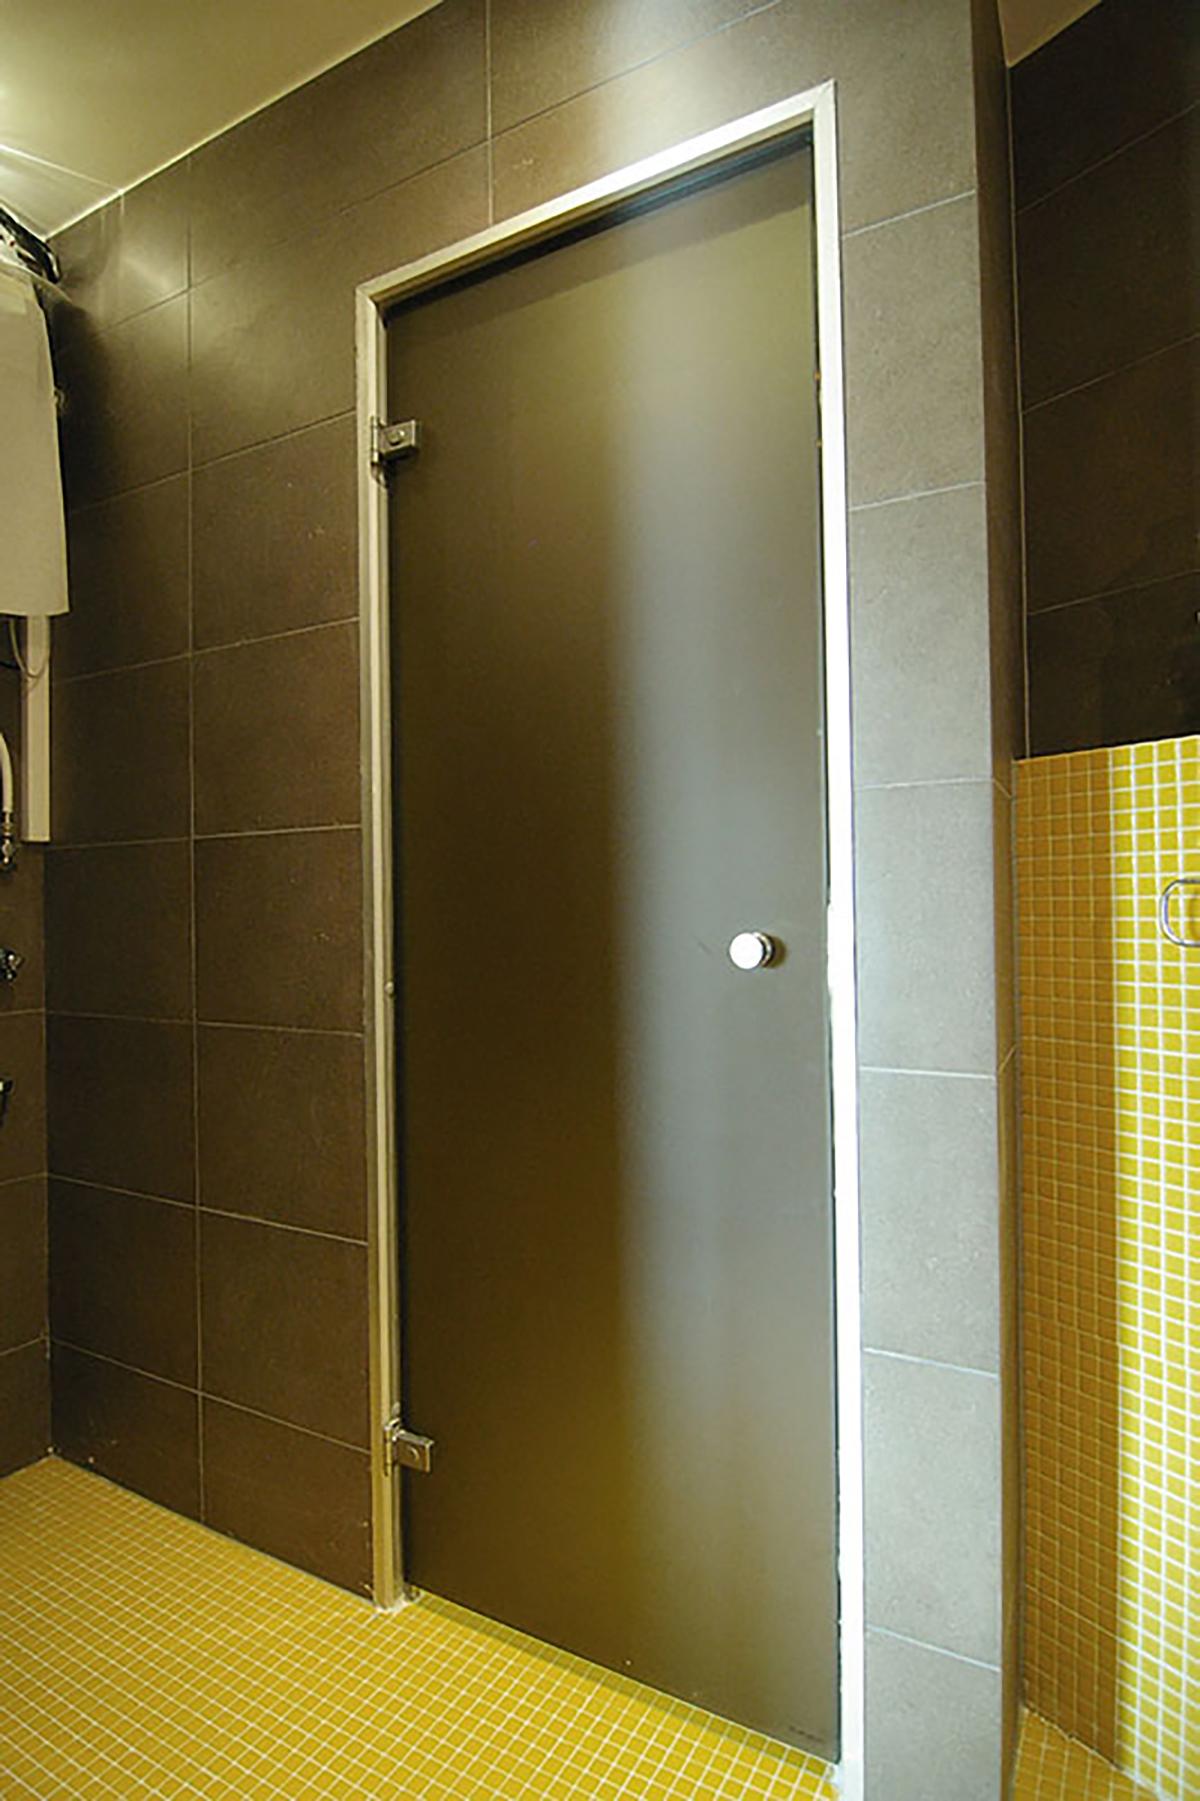 Ad porte de hammam opaque r versible 60 x 190 gris mat for Solution porte 60 doors